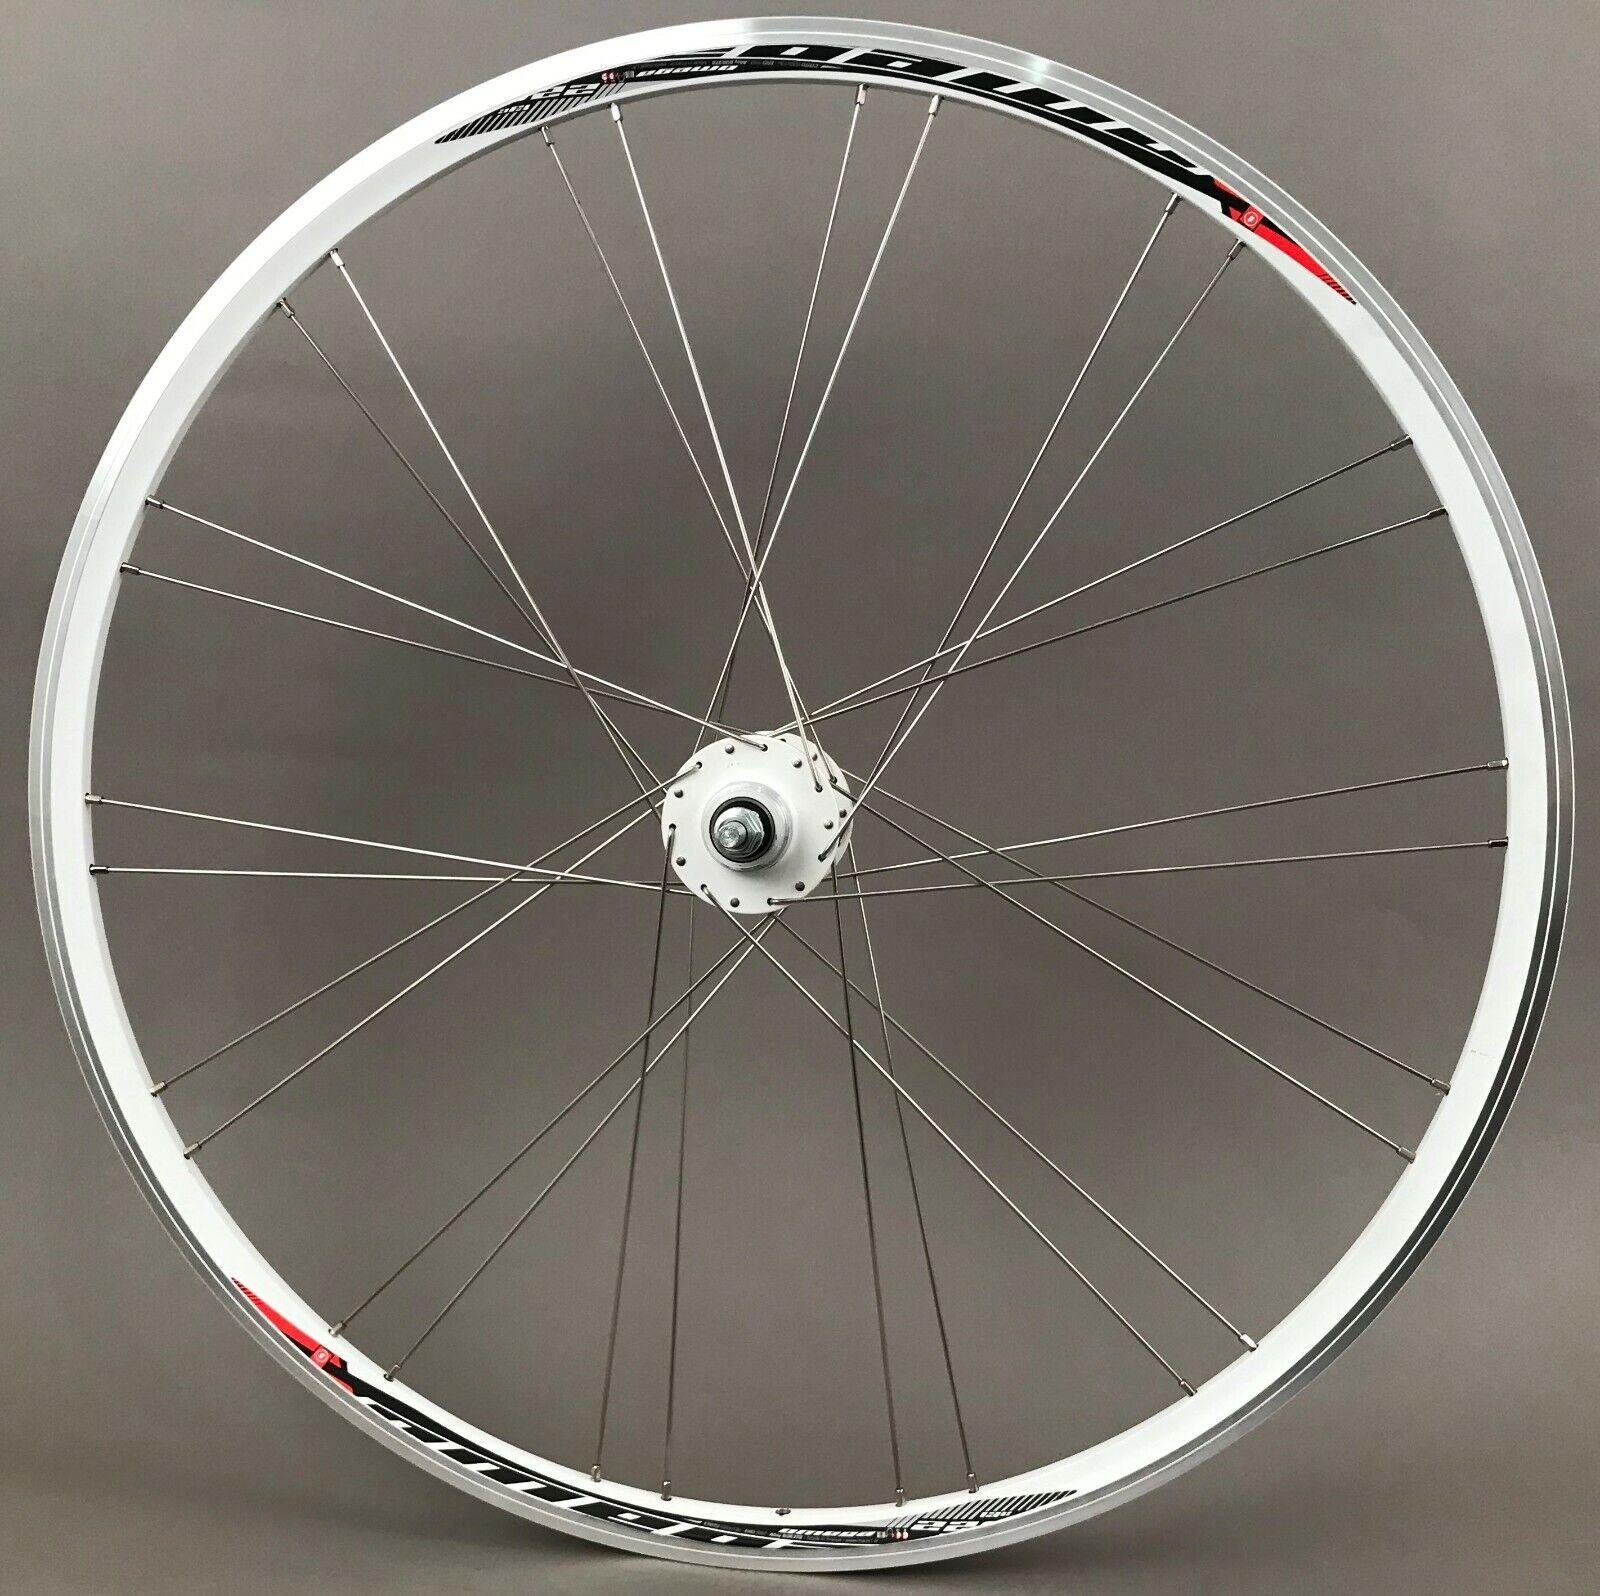 Image 1 - Mach1 Omega Fixed Freewheel Track Single Speed Bike Rear Wheel Clincher 28 Spoke